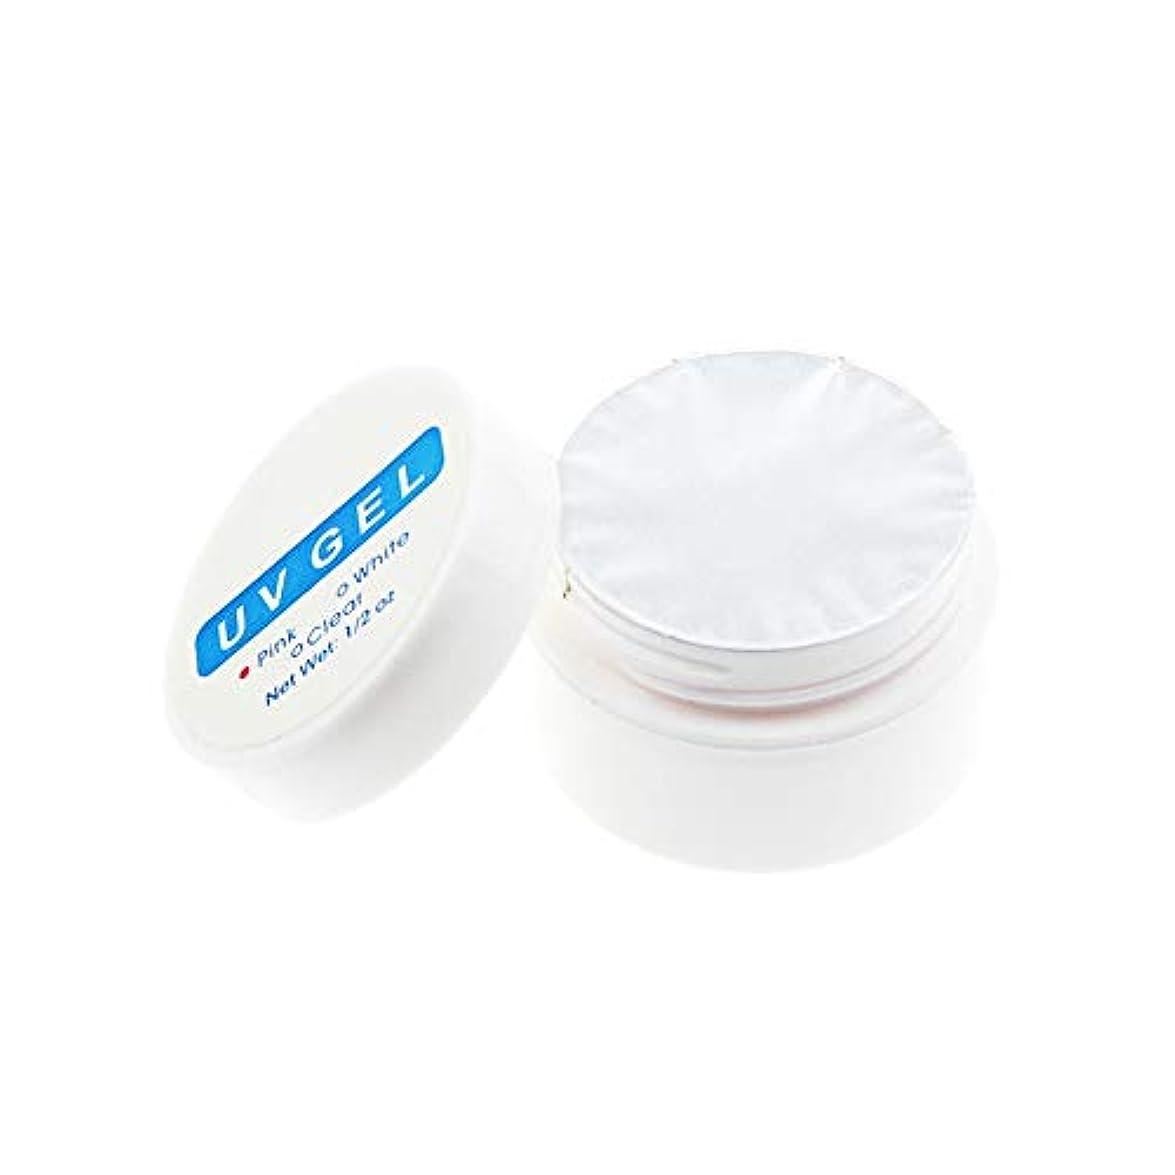 1st market 透明な実用的なUV光線療法ネイル用品ネイル用クリスタルネイル延長接着剤必須のUVジェル、透明